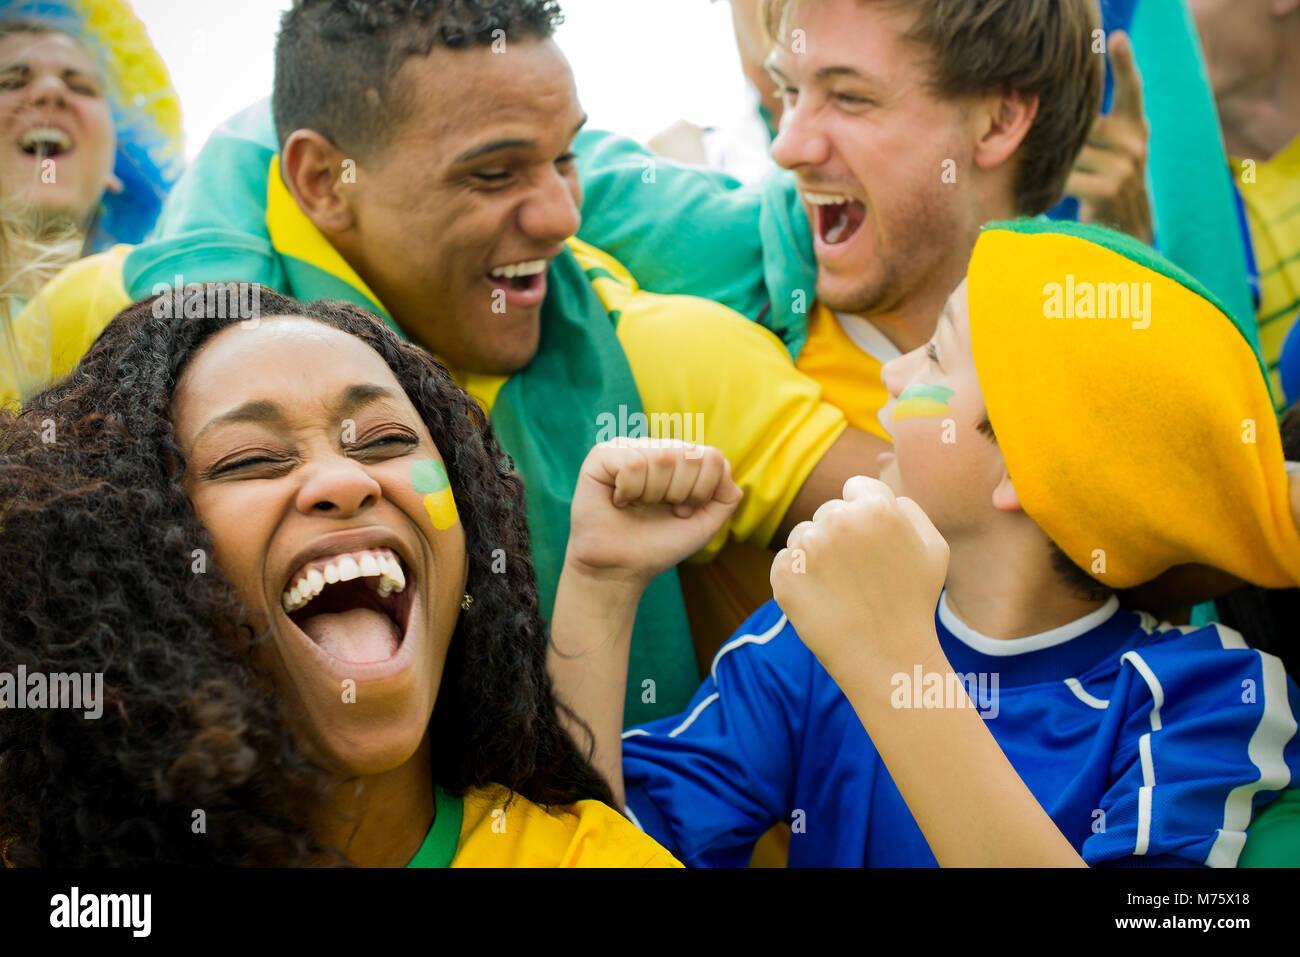 Brasilianischen Fußball-Fans feiern Sieg im Match Stockbild